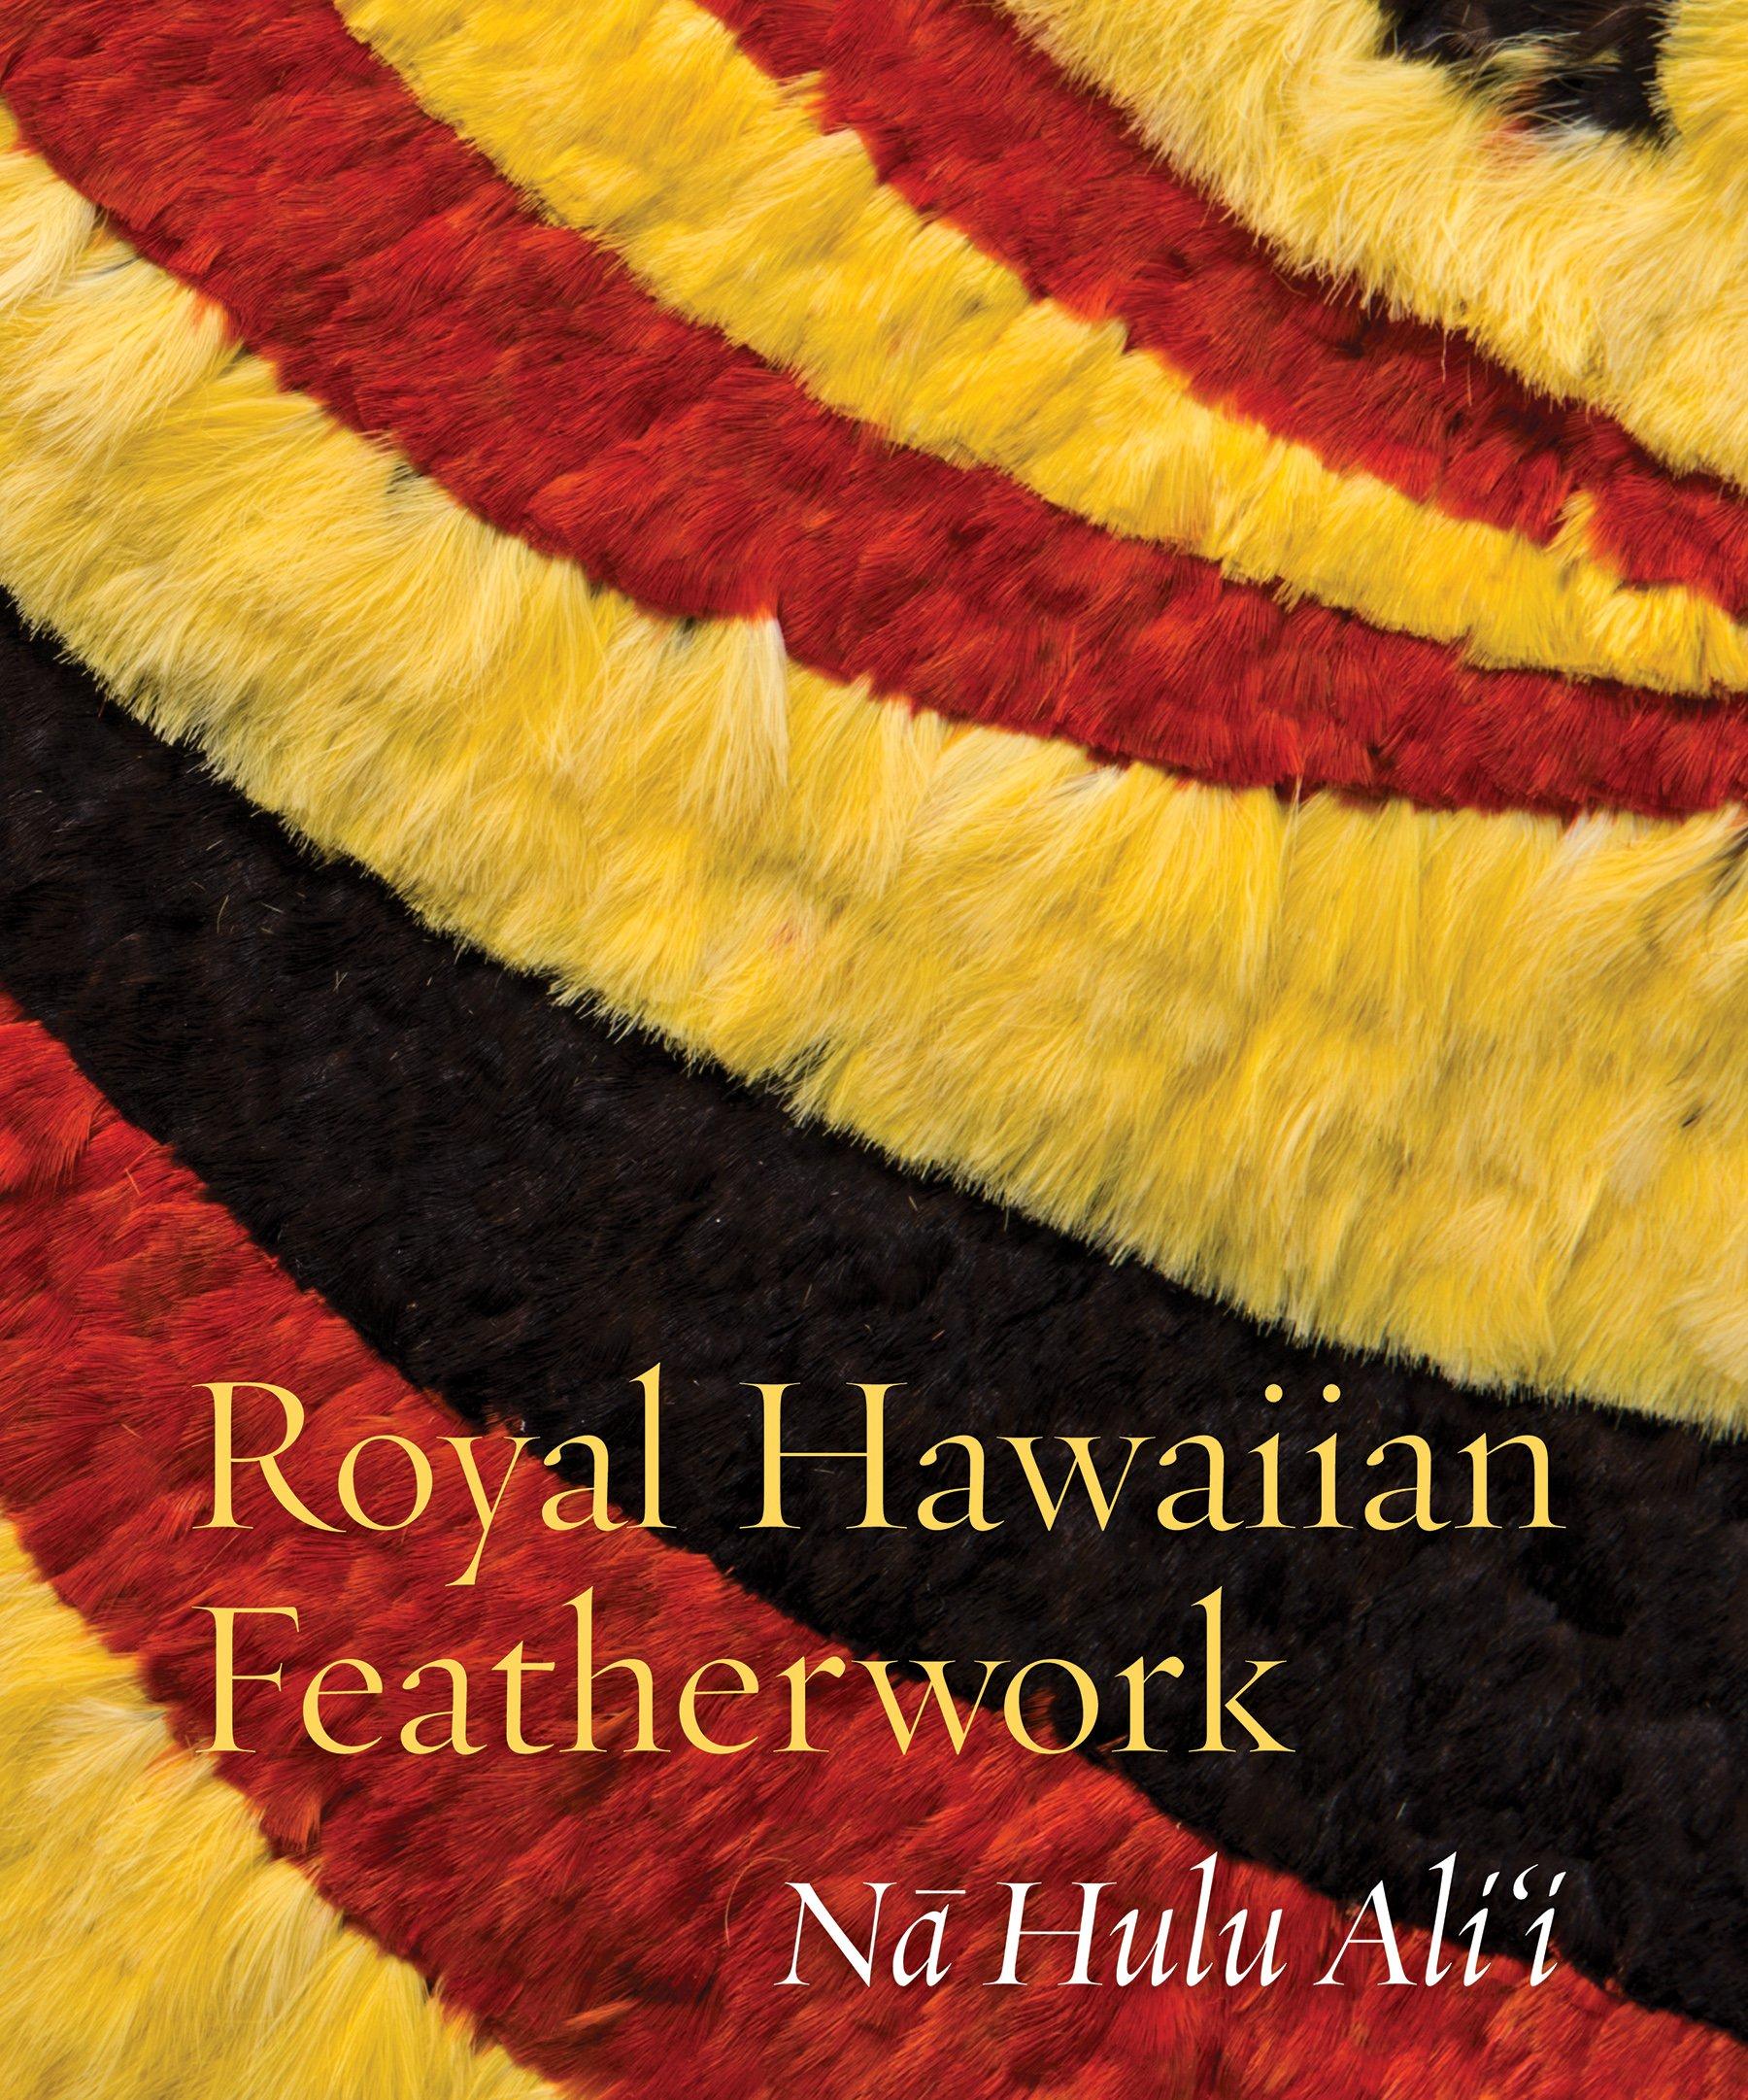 Royal Hawaiian Featherwork Na Hulu Alii Leah Pualahaole Caldeira - Us zip code for hulu